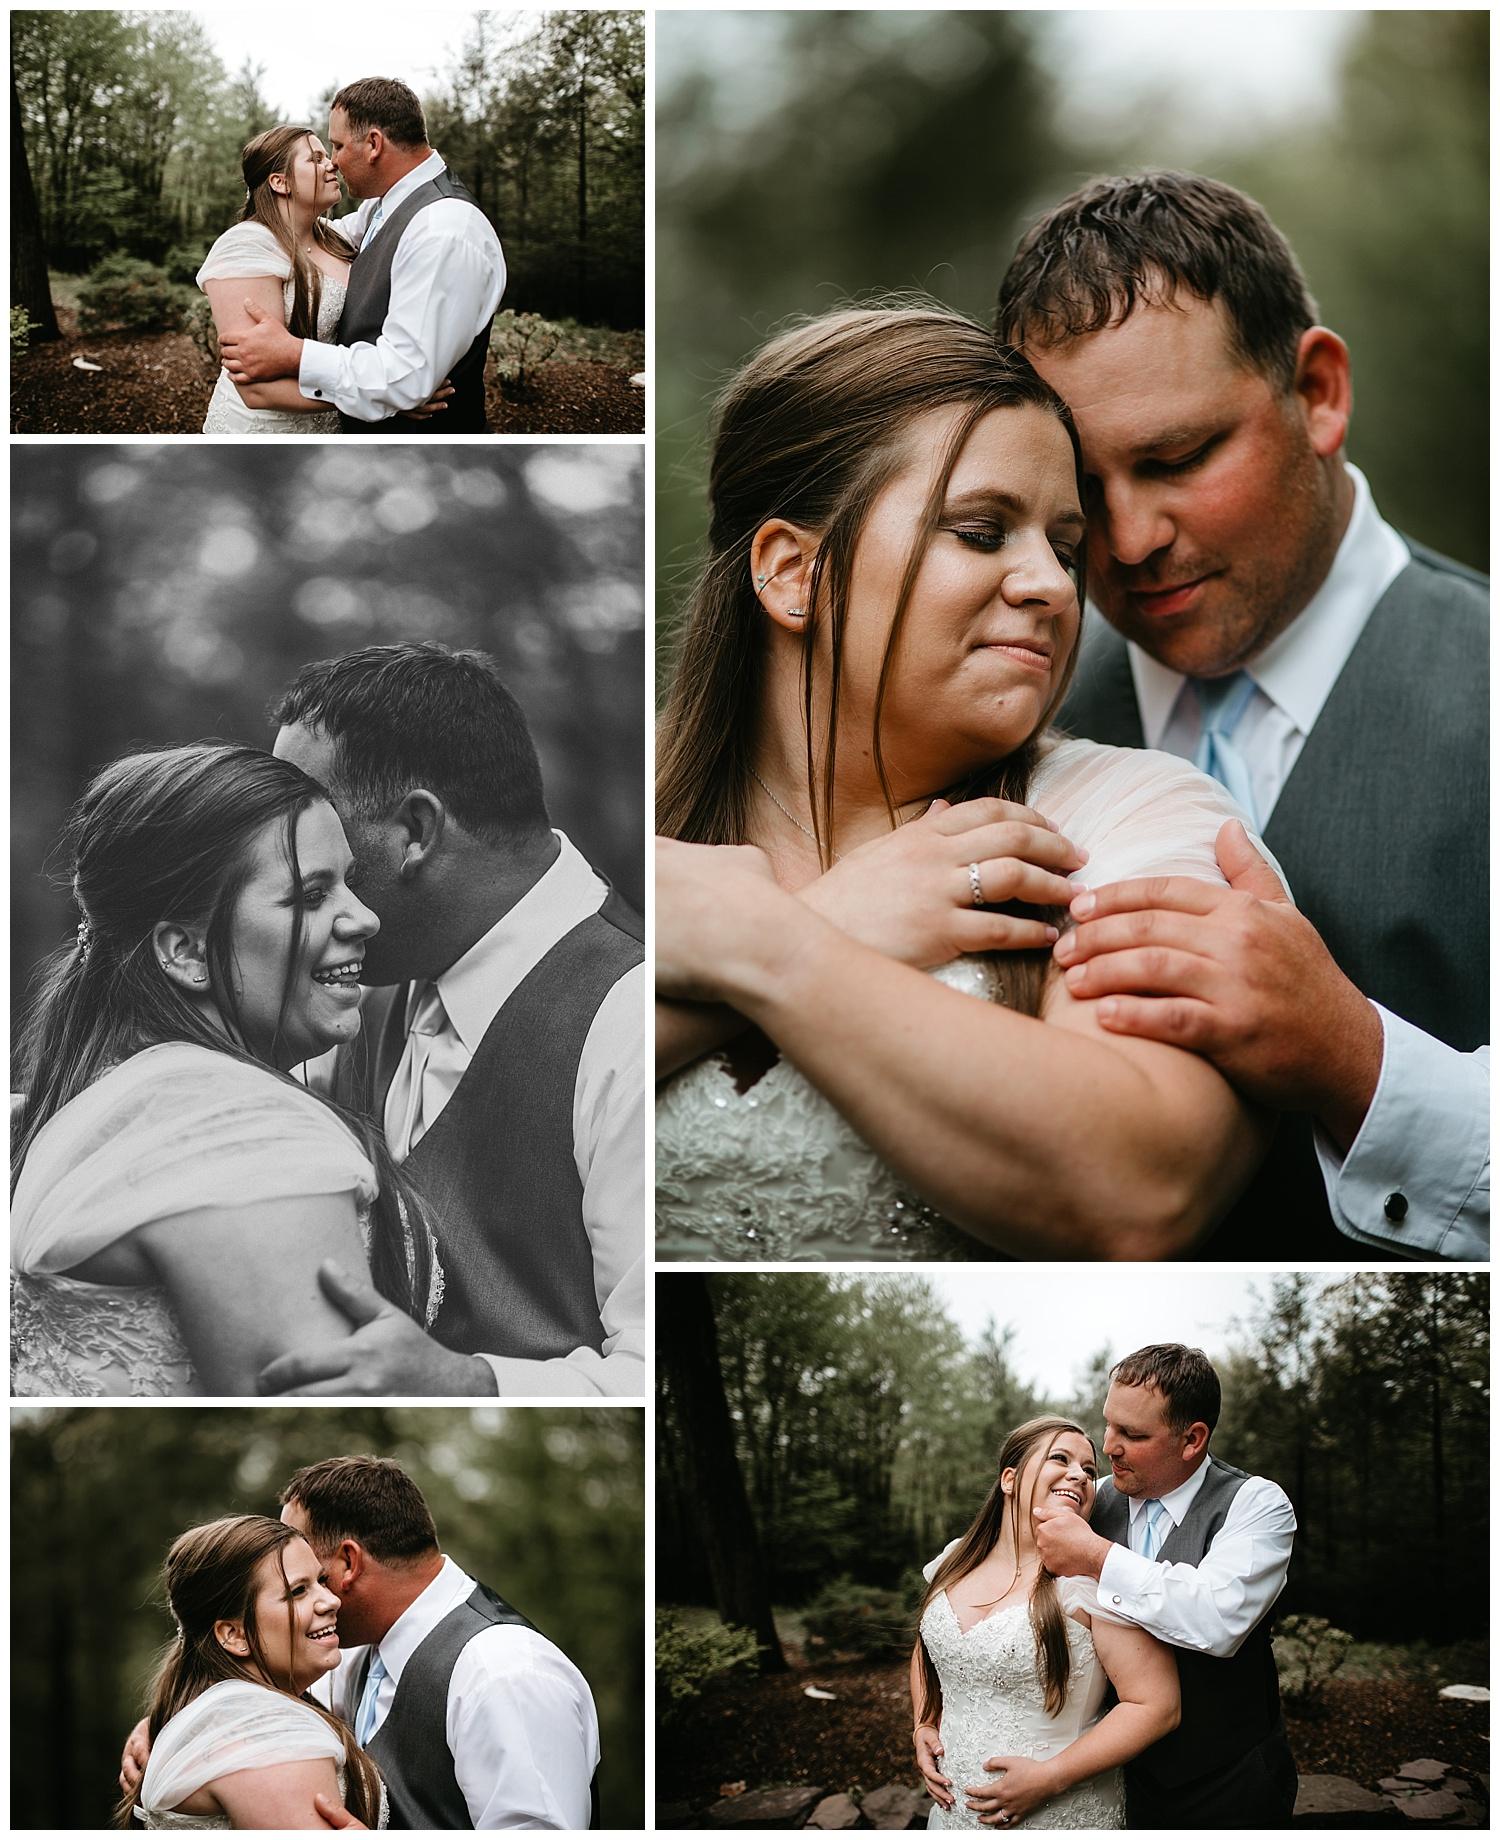 NEPA-wedding-photographer-at-the-Stroudsmoor-Country-Inn-Stroudsburg-PA_0012.jpg